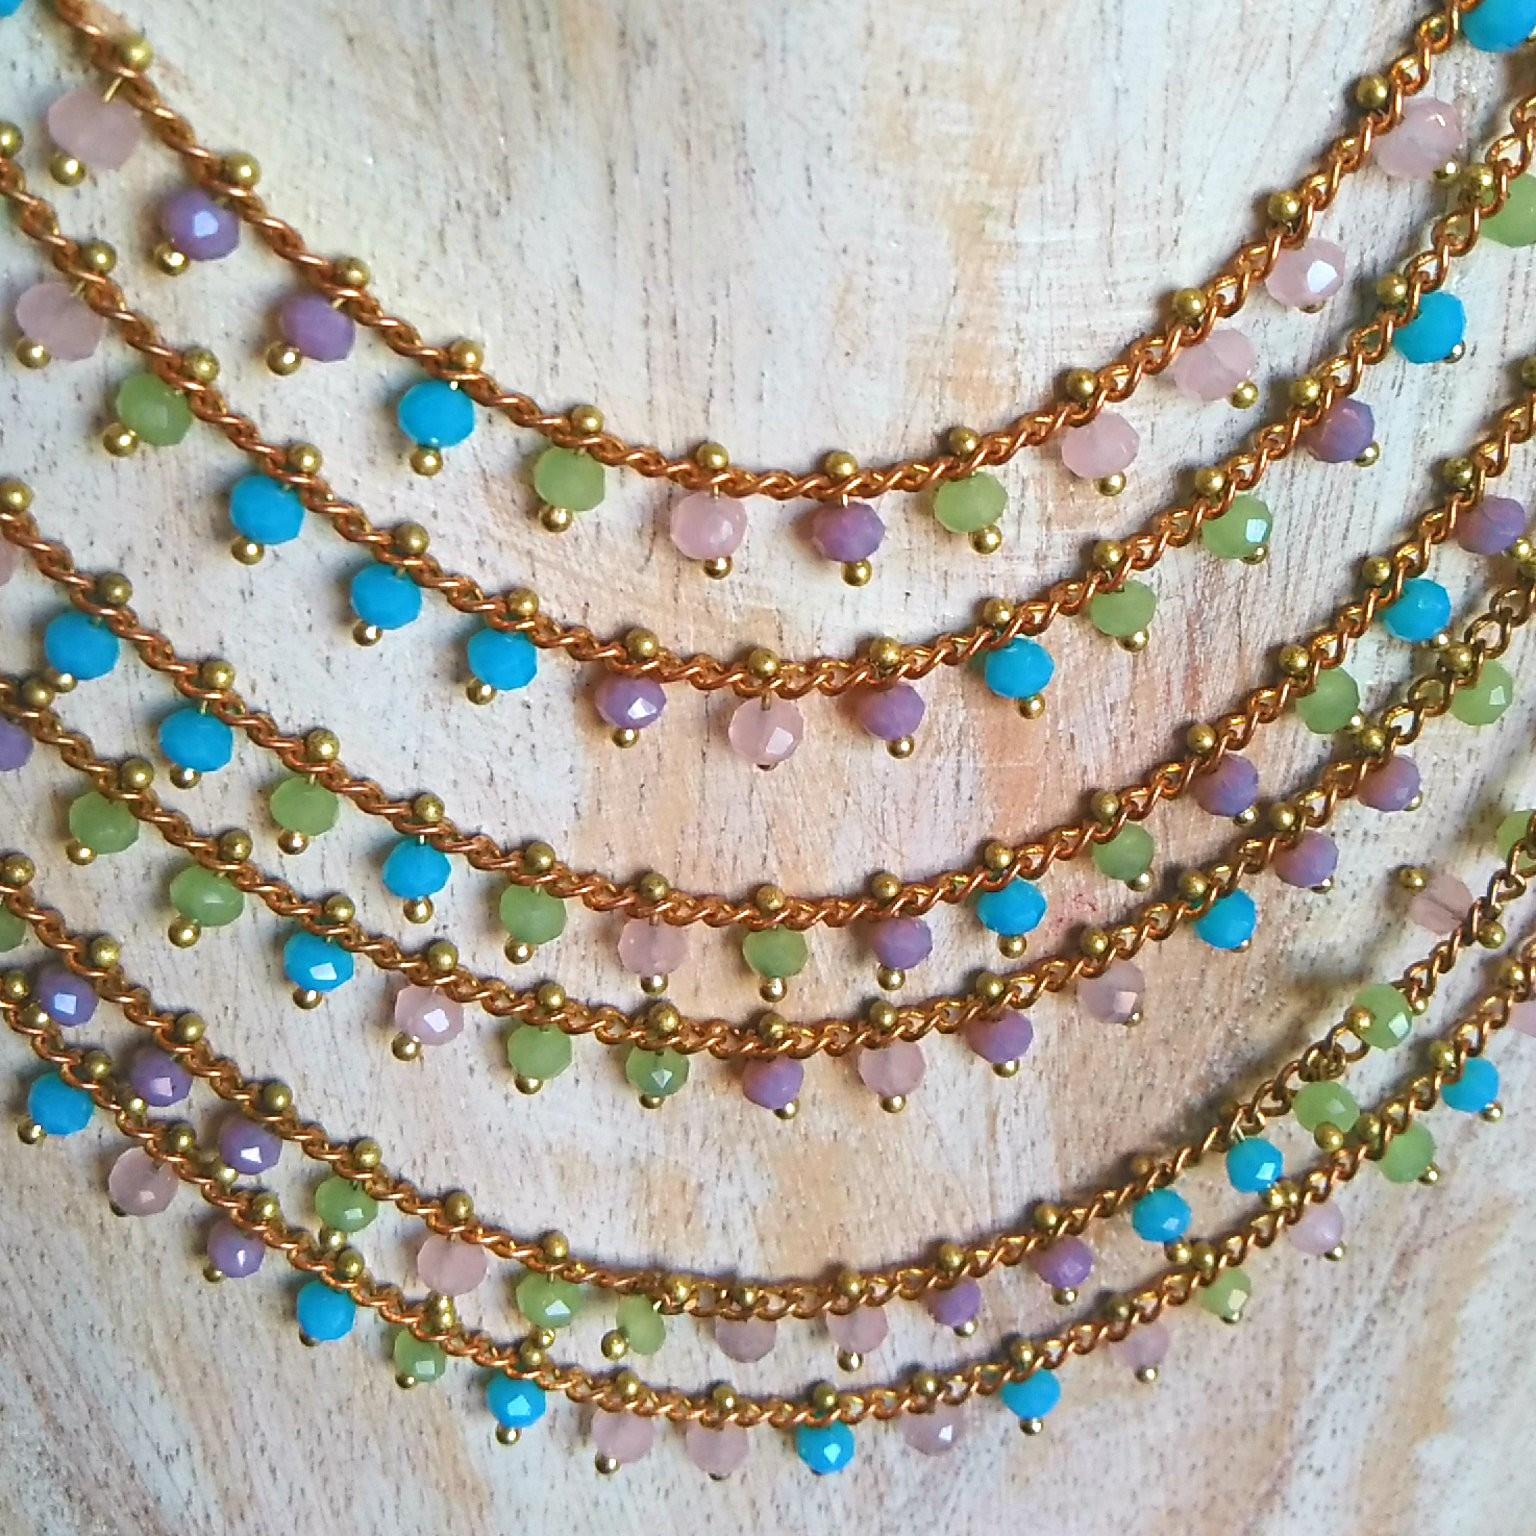 0304a0ed5d48 Collares de Moda - Comprar collares online - Happy Uky